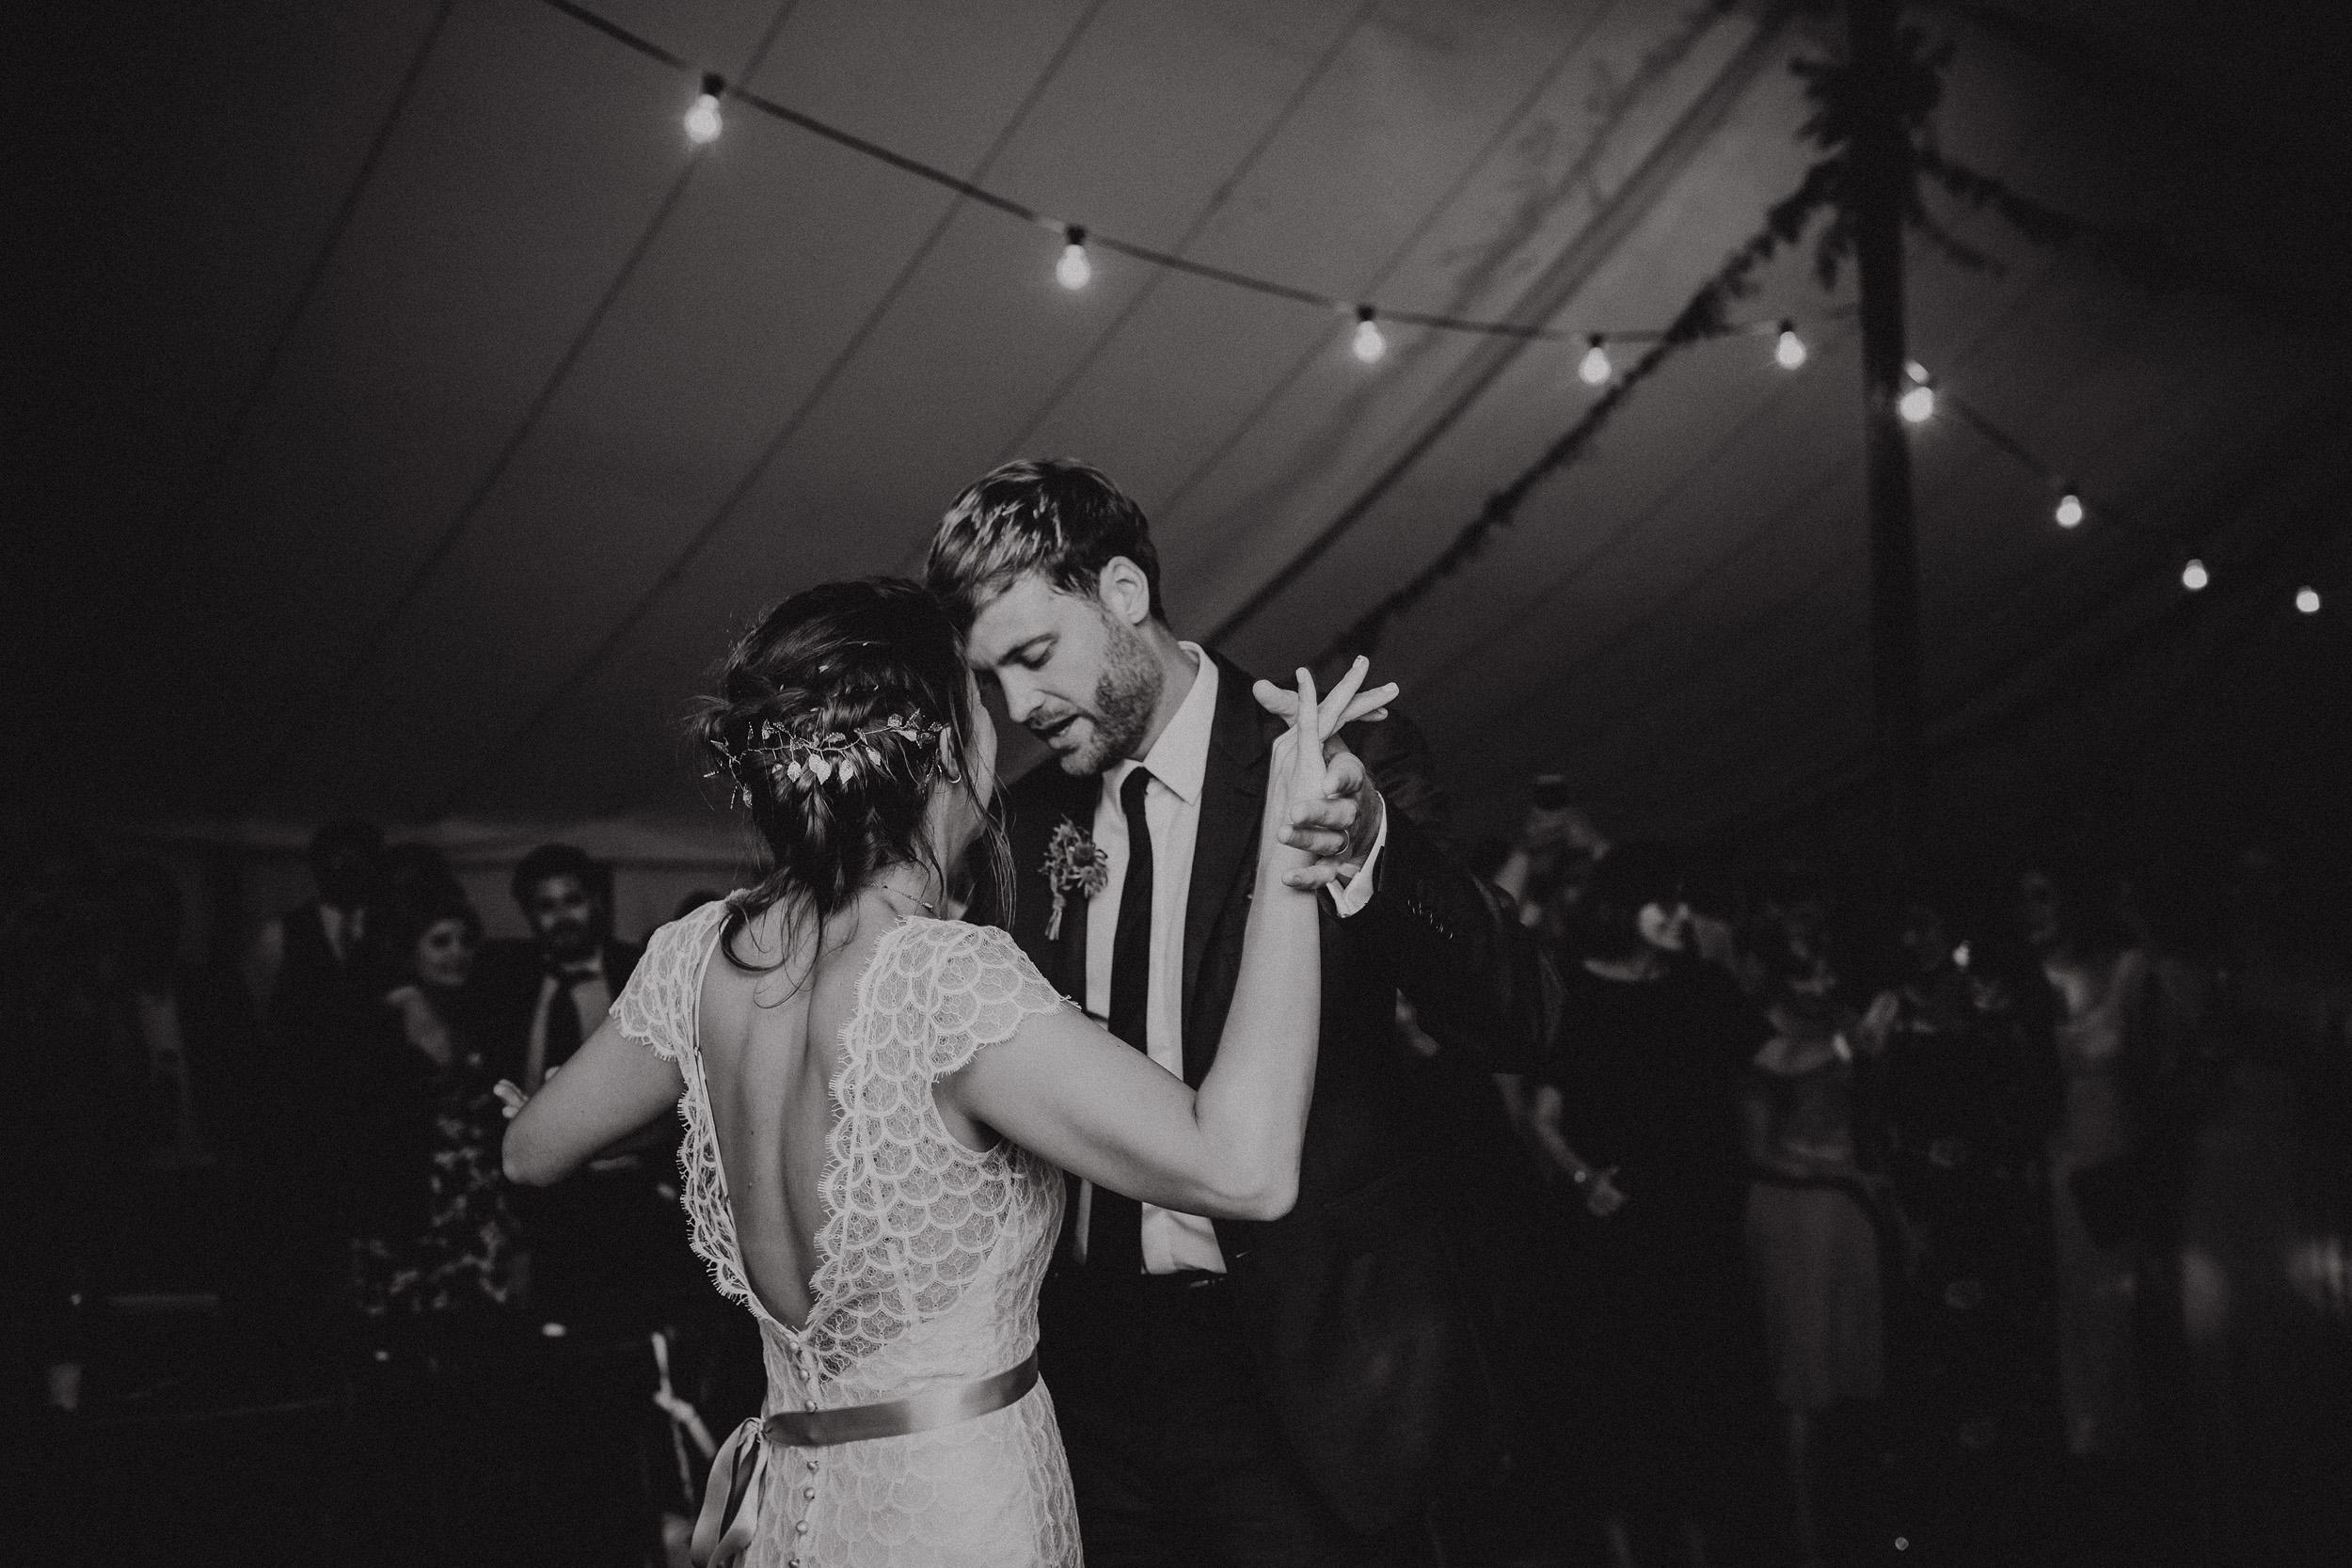 Martha-Laid-Back-Garden-Wedding-Lace-Wedding-Dress-Bohemian-Kate-Beaumont-62.jpg